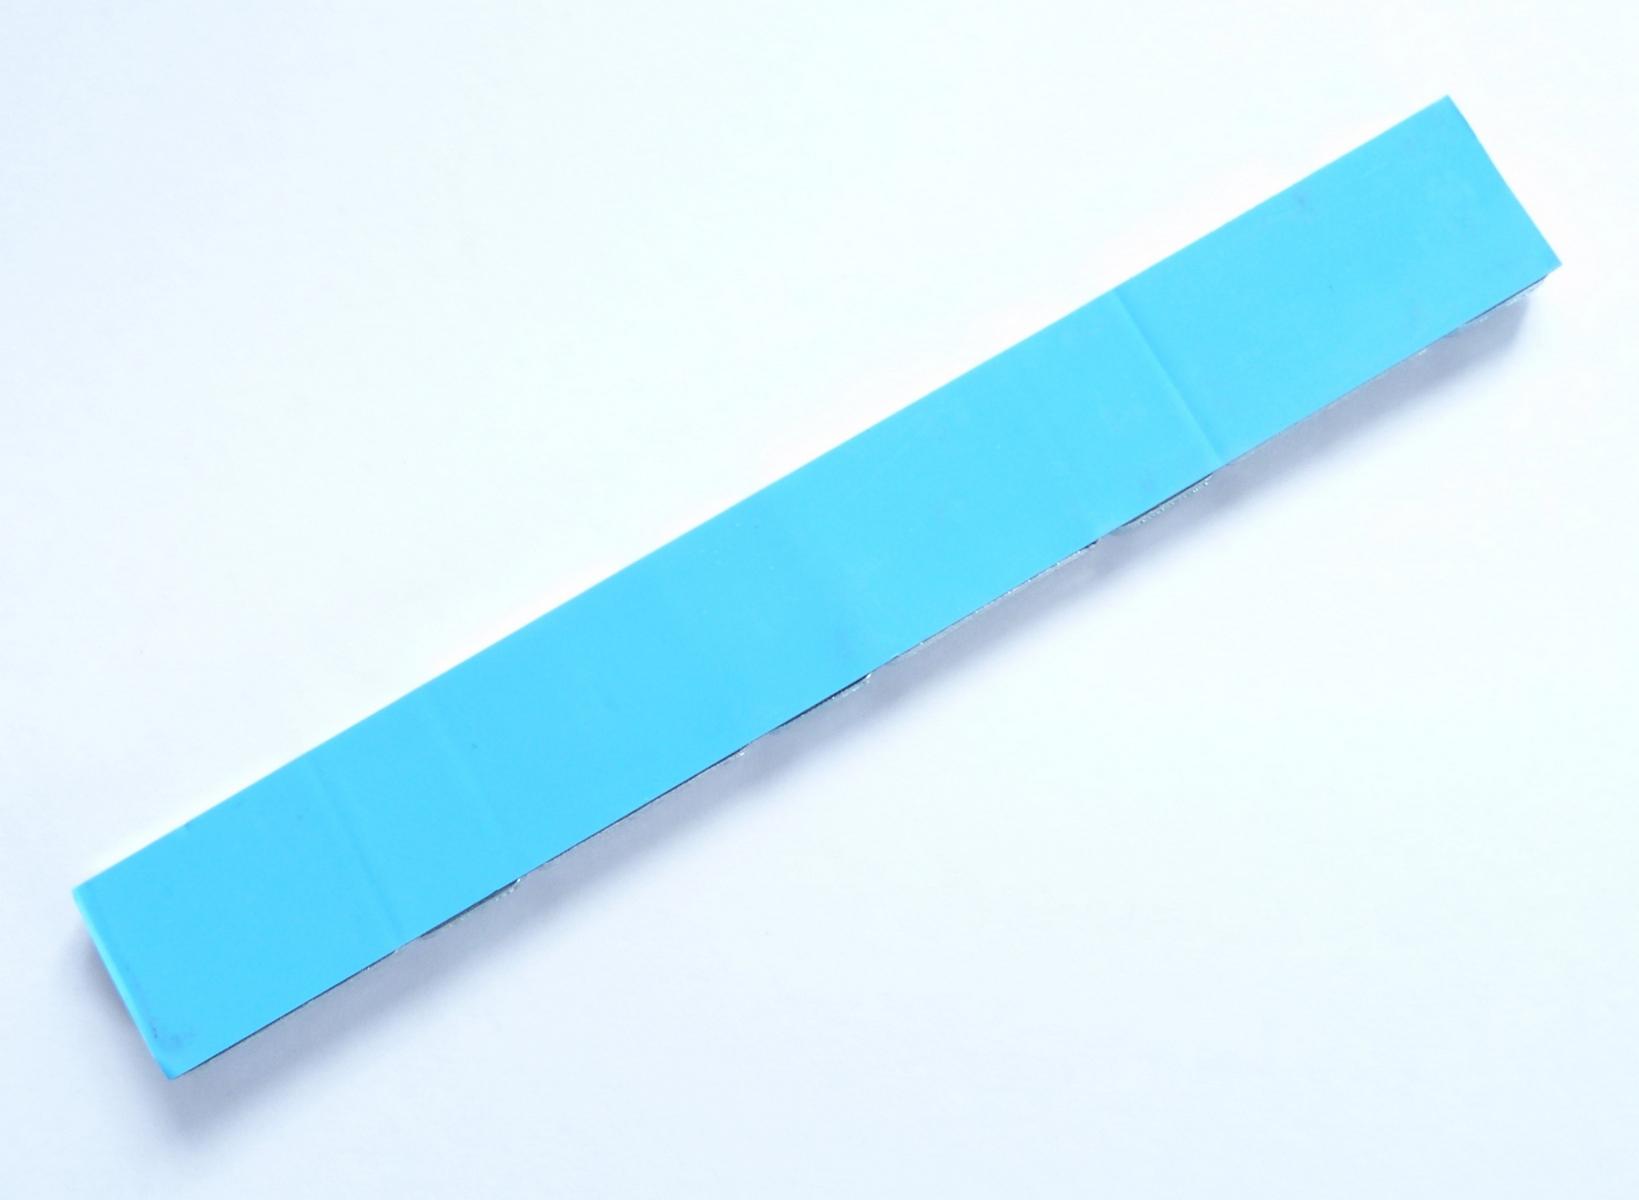 8 Individual Slimline Leadfree 5g Self Adhesive Coated Steel Ballast Weights